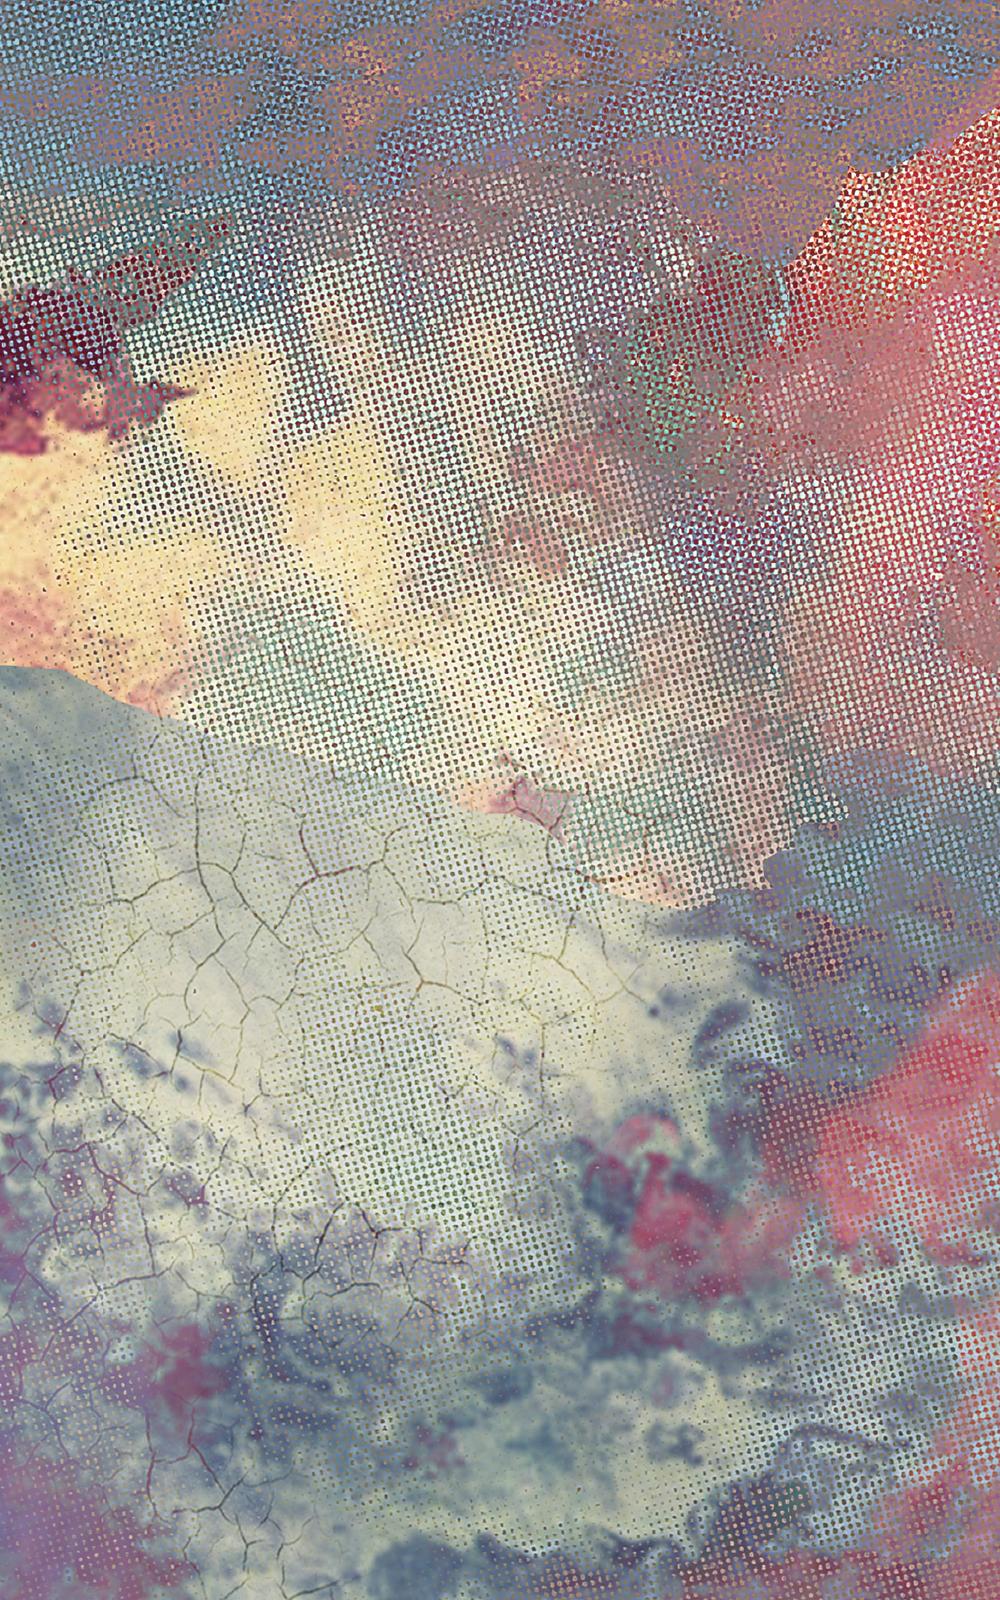 Case Simmons, Simmons & Burke, If Not Winter Composite #1, Kohn Gallery, Composite Image, Lightjet Print, Digital Collage,Digital Art, Photoshop Collage, Contemporary Collage,Case Simmons Art, Case Simmons Artist, Collage Fine Art, Hyper Collage, Digital Painting,Digital Landscape